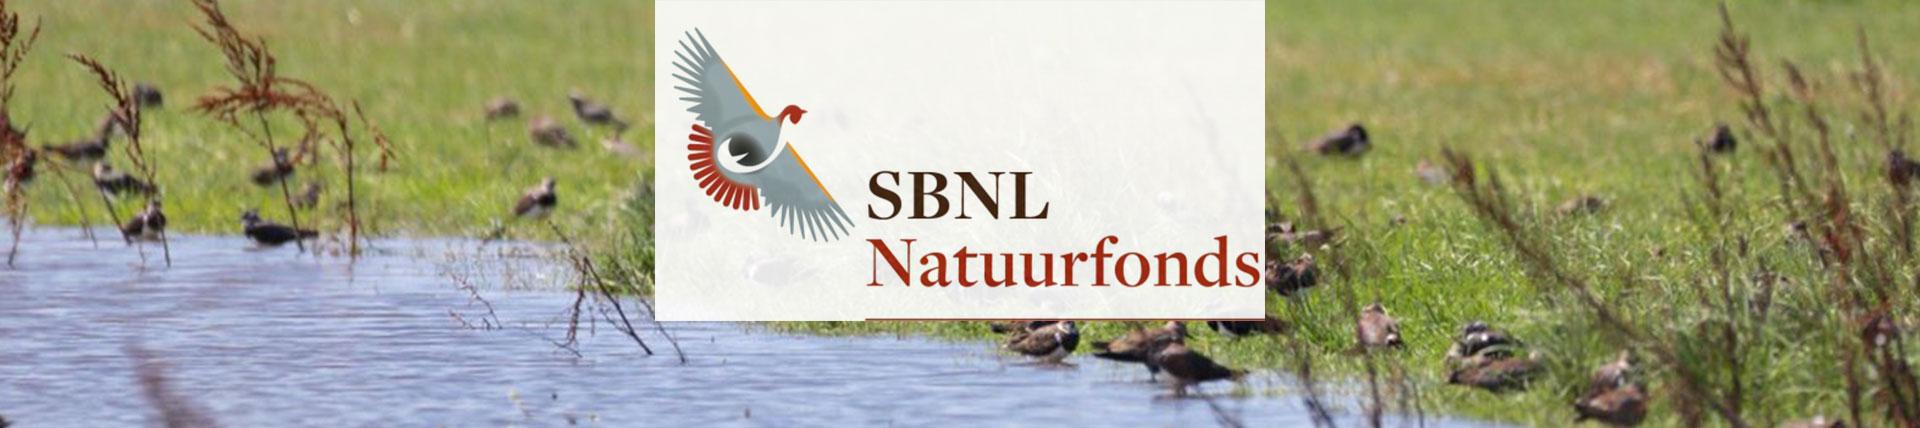 SBNL-plas-dras-gebieden